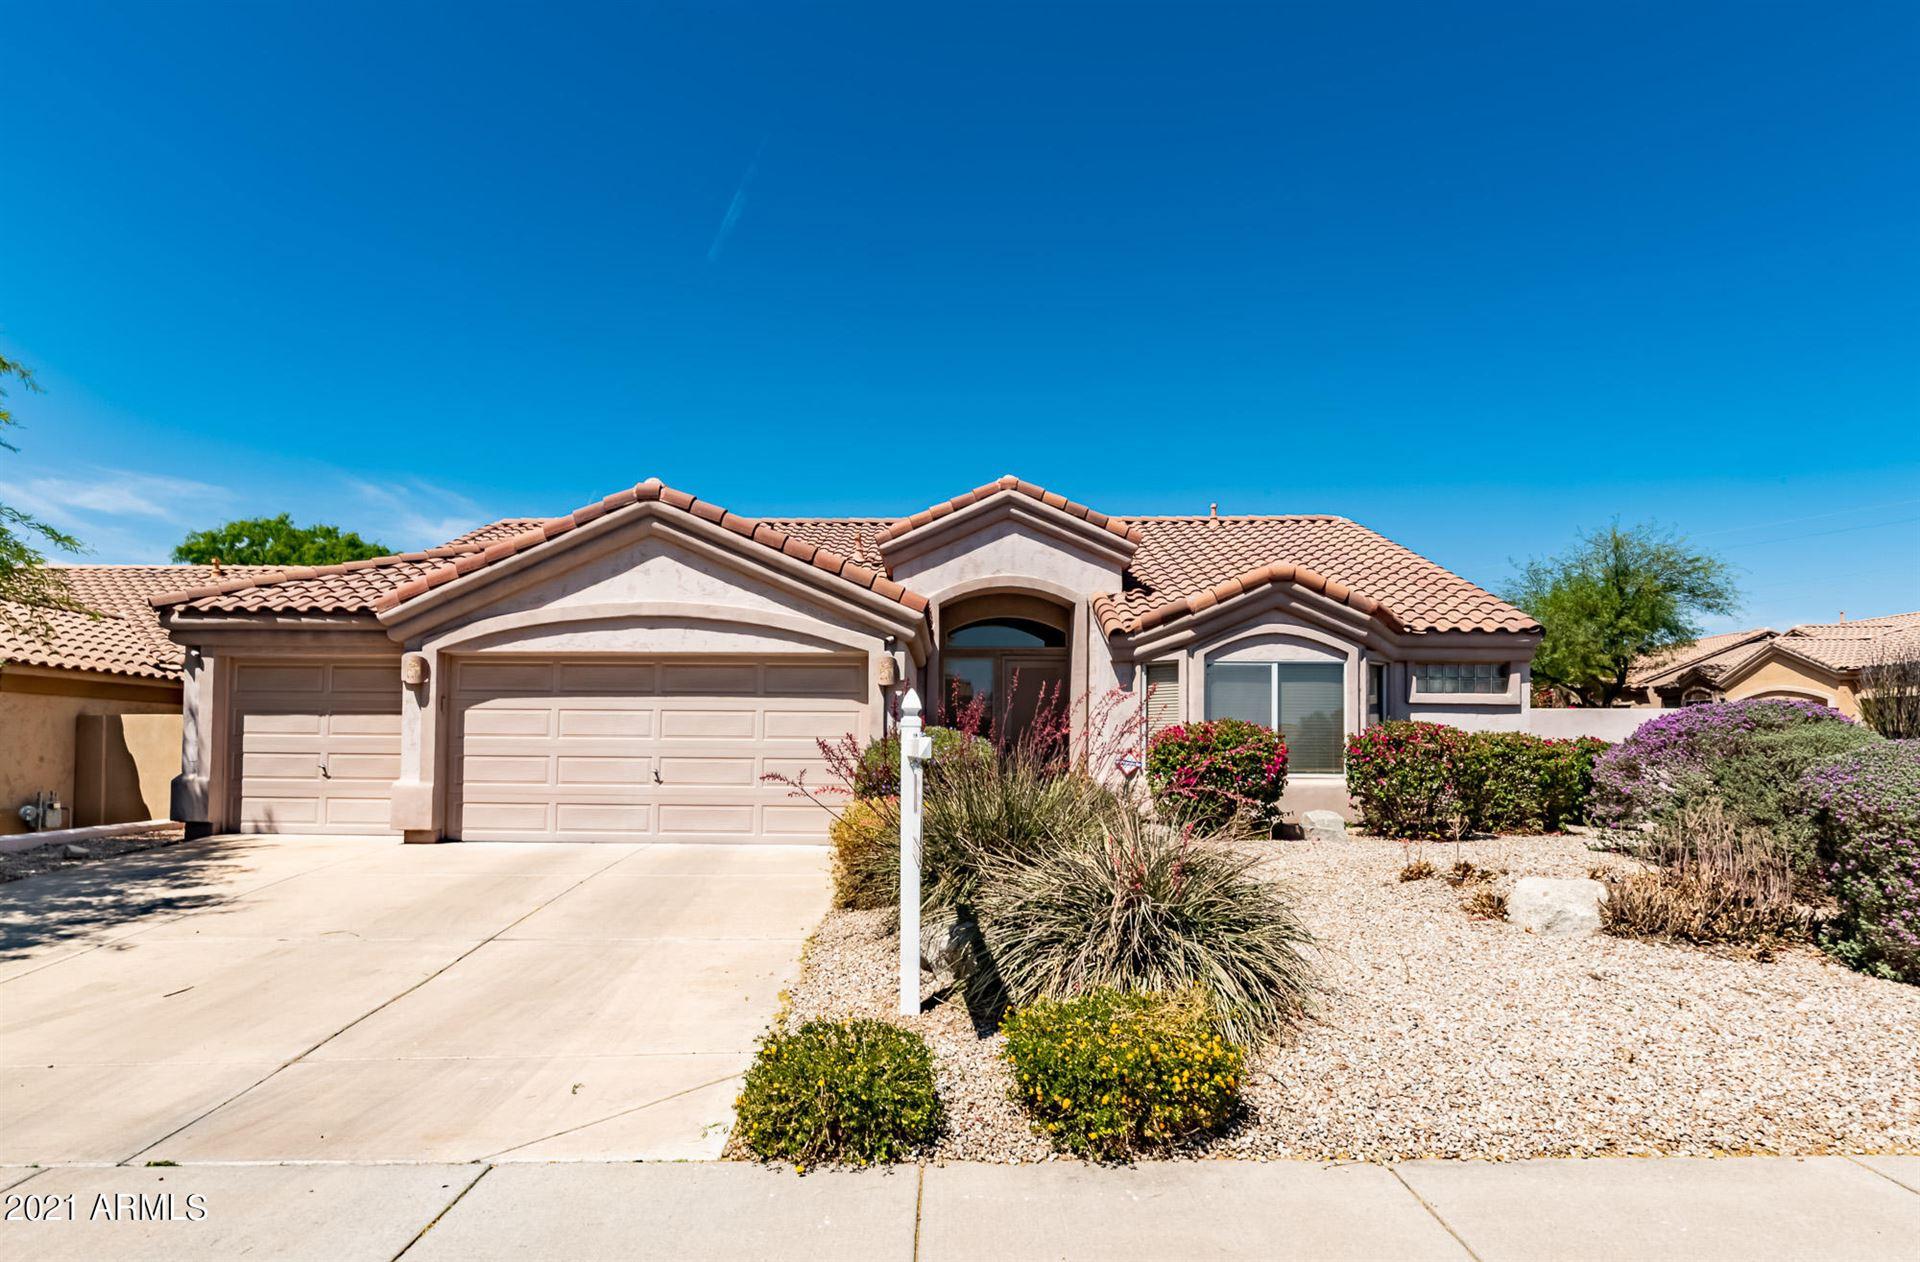 Photo of 4826 E PEAK VIEW Road, Cave Creek, AZ 85331 (MLS # 6229687)